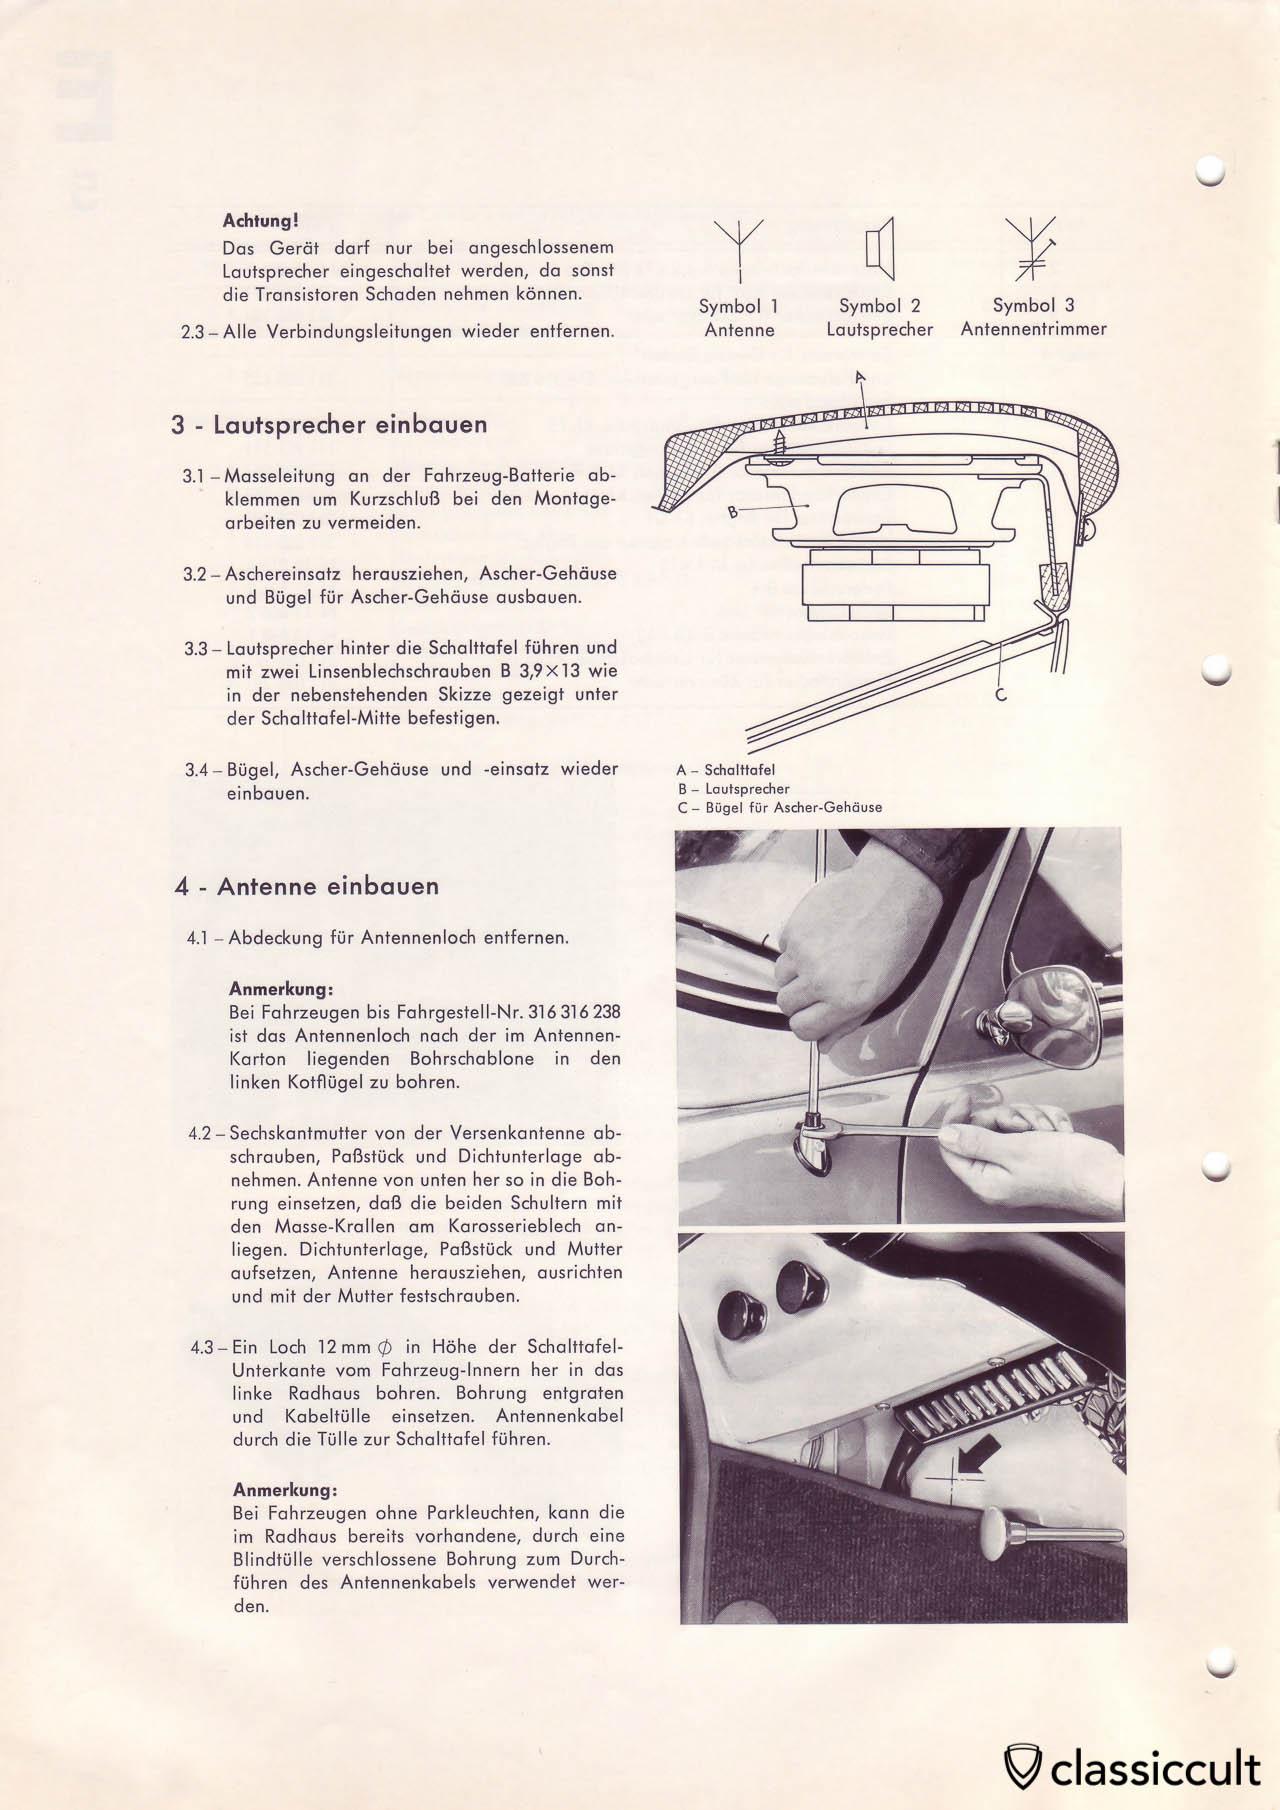 citroen xsara picasso wiring diagram wirdig toyota camry radio wiring diagram on radio installation instructions